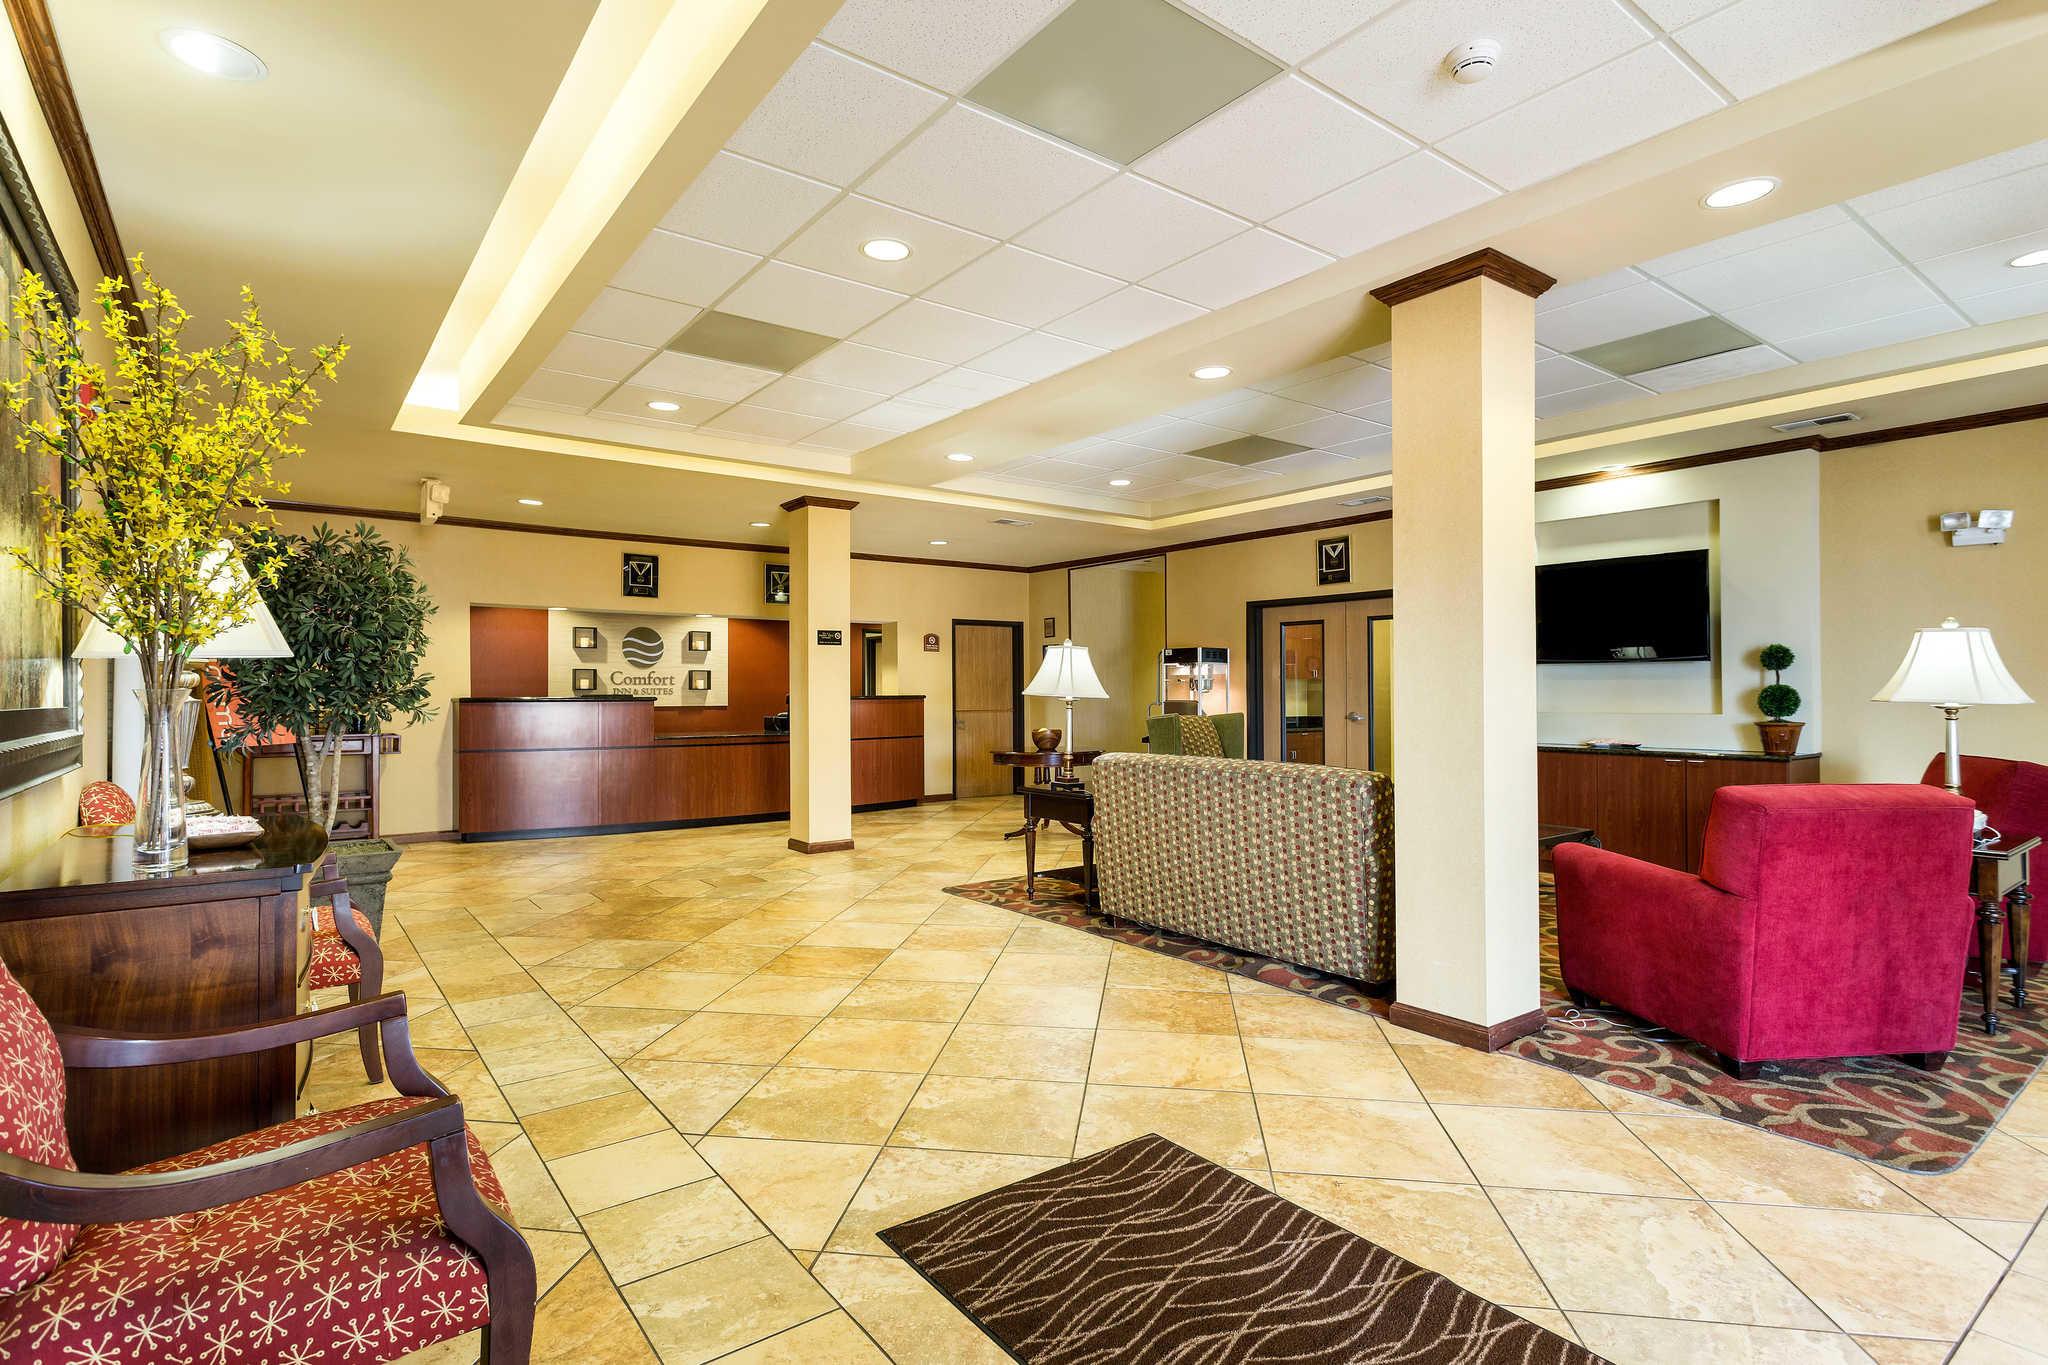 Comfort Inn Amp Suites In Blytheville Ar 72315